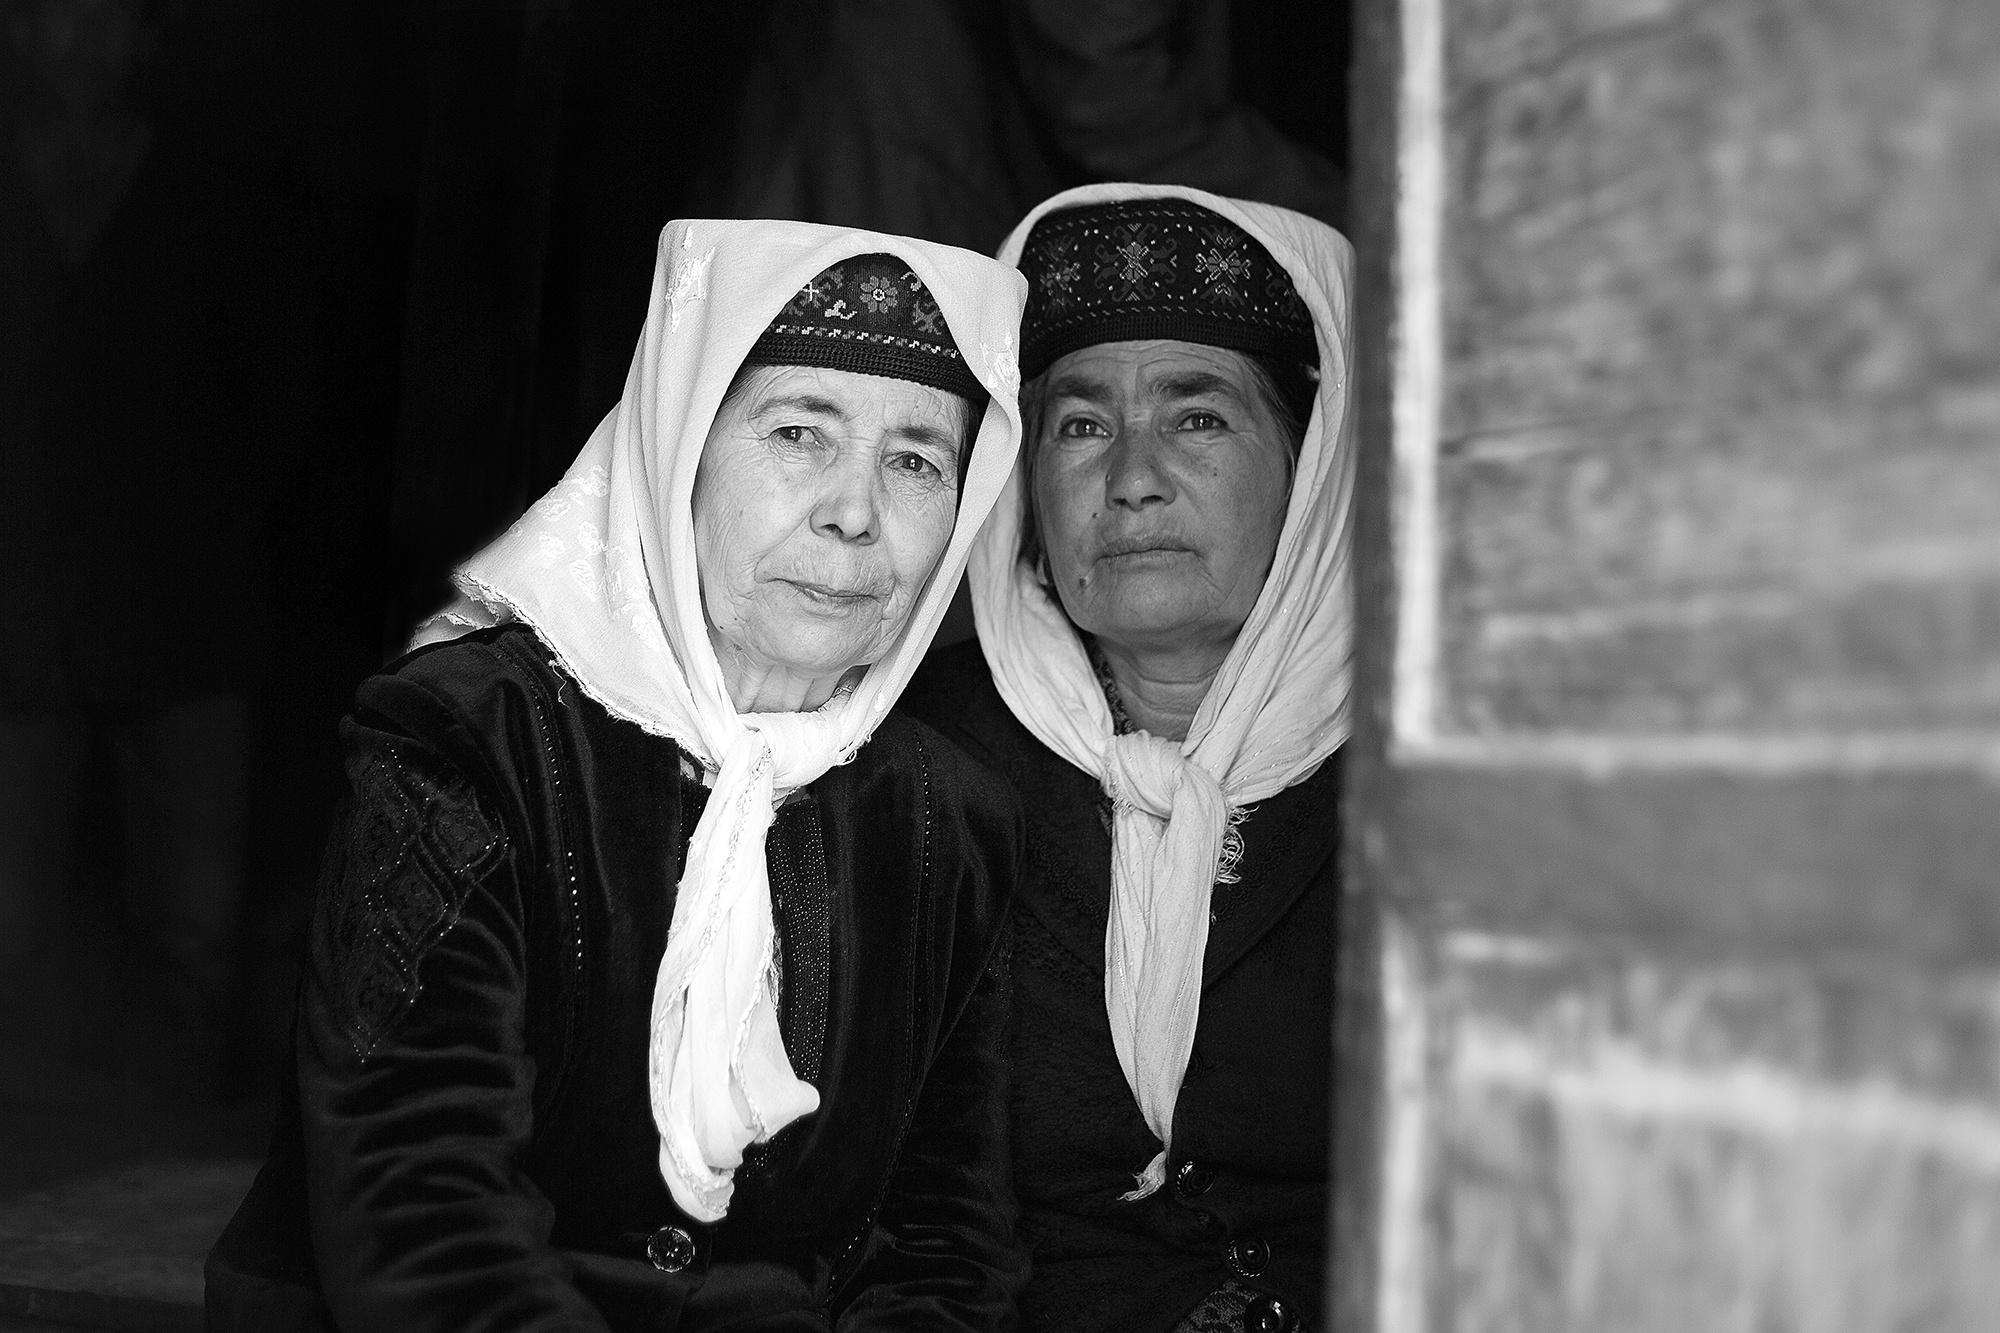 Xinjiang Région ouïghoure Maxime Crozet Identité Chine Tadjikes Femmes